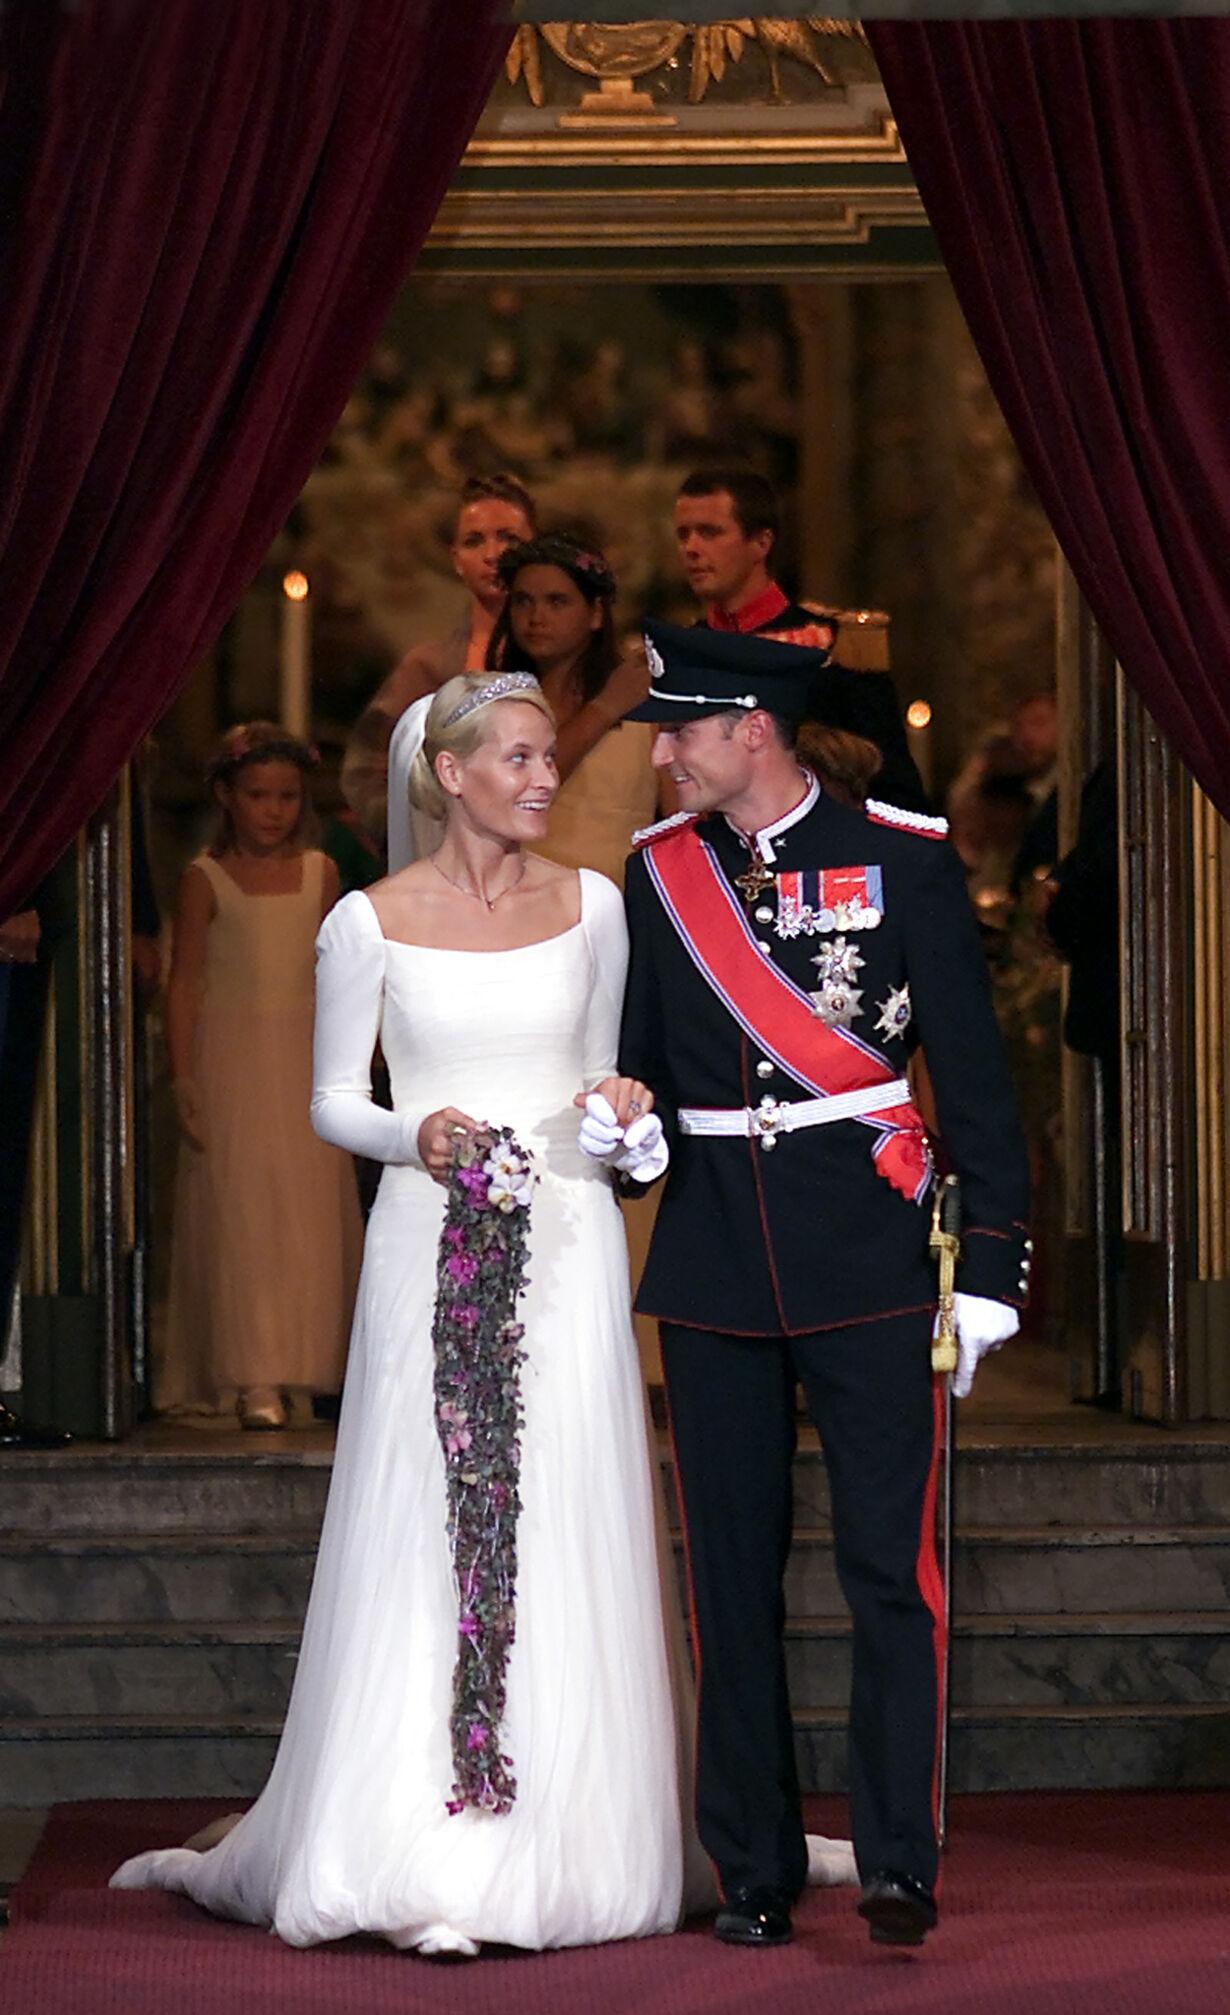 NORWAY ROYALS WEDDING